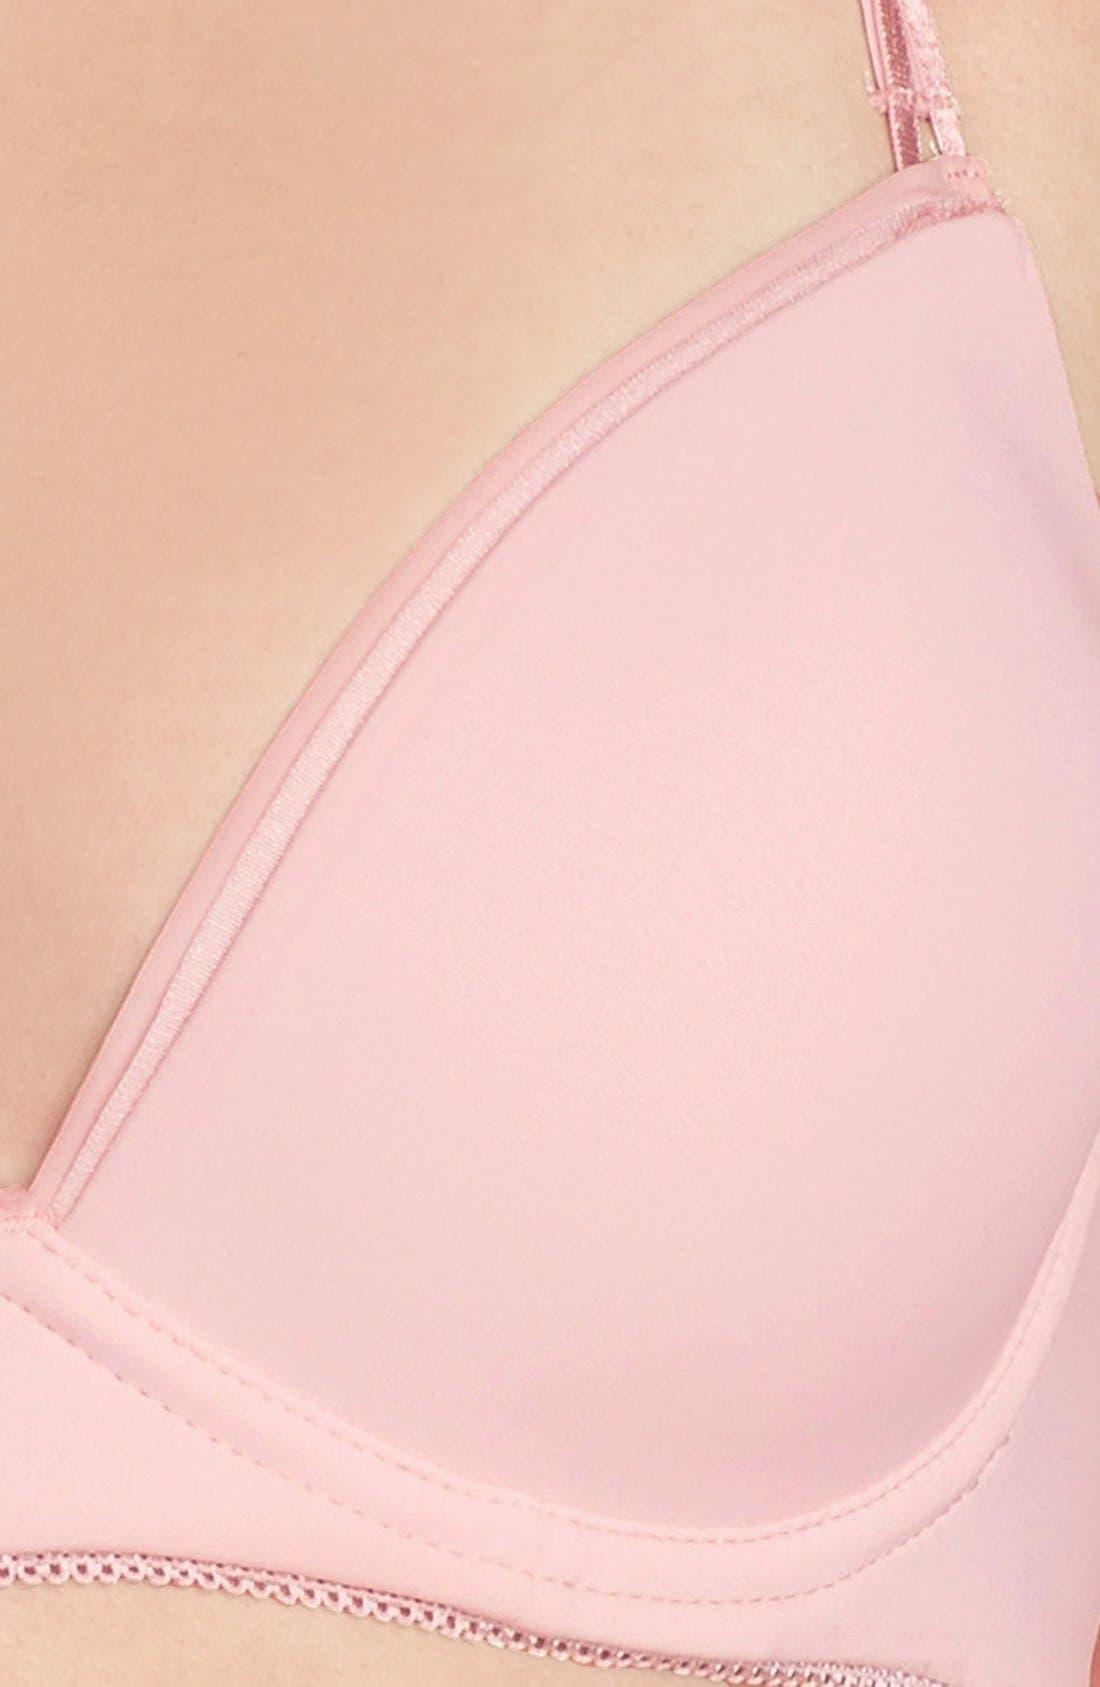 'Seductive Comfort - Customized Lift' Underwire Bra,                             Alternate thumbnail 107, color,